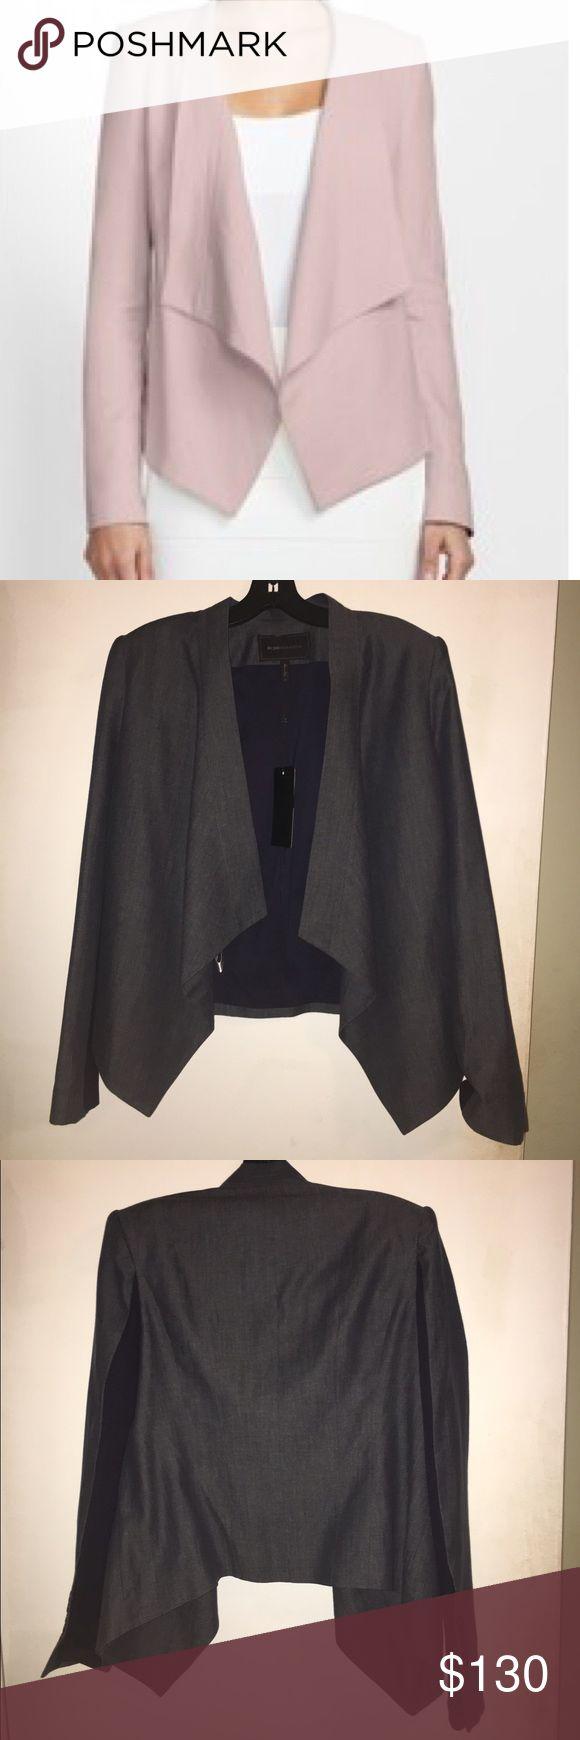 BCBGMaxAzria relaxed blazer Draped blazer in Indigo/Dark Blue. Casual but can easily be dressed up. BCBGMaxAzria Jackets & Coats Blazers